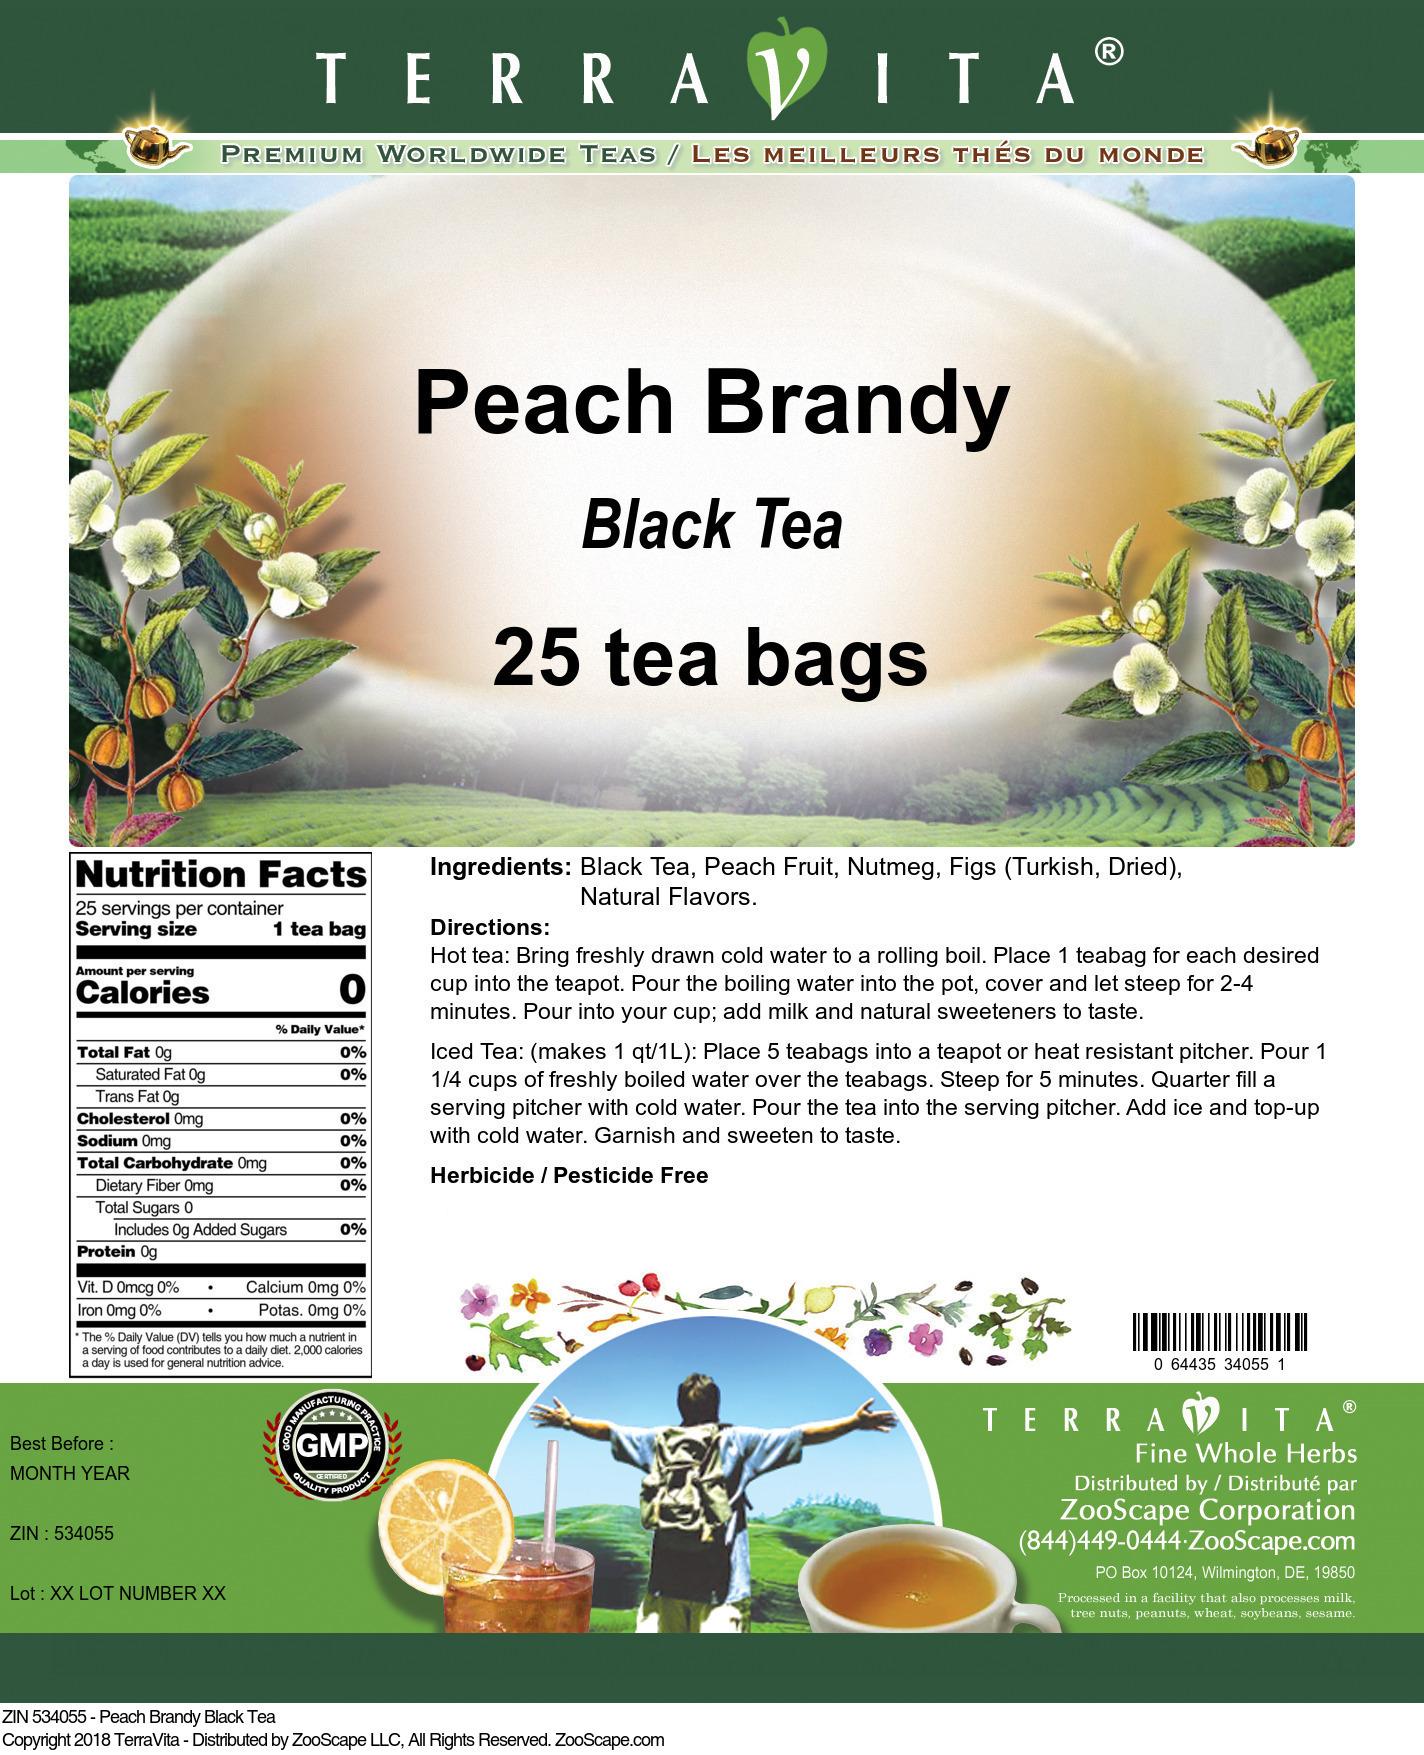 Peach Brandy Black Tea